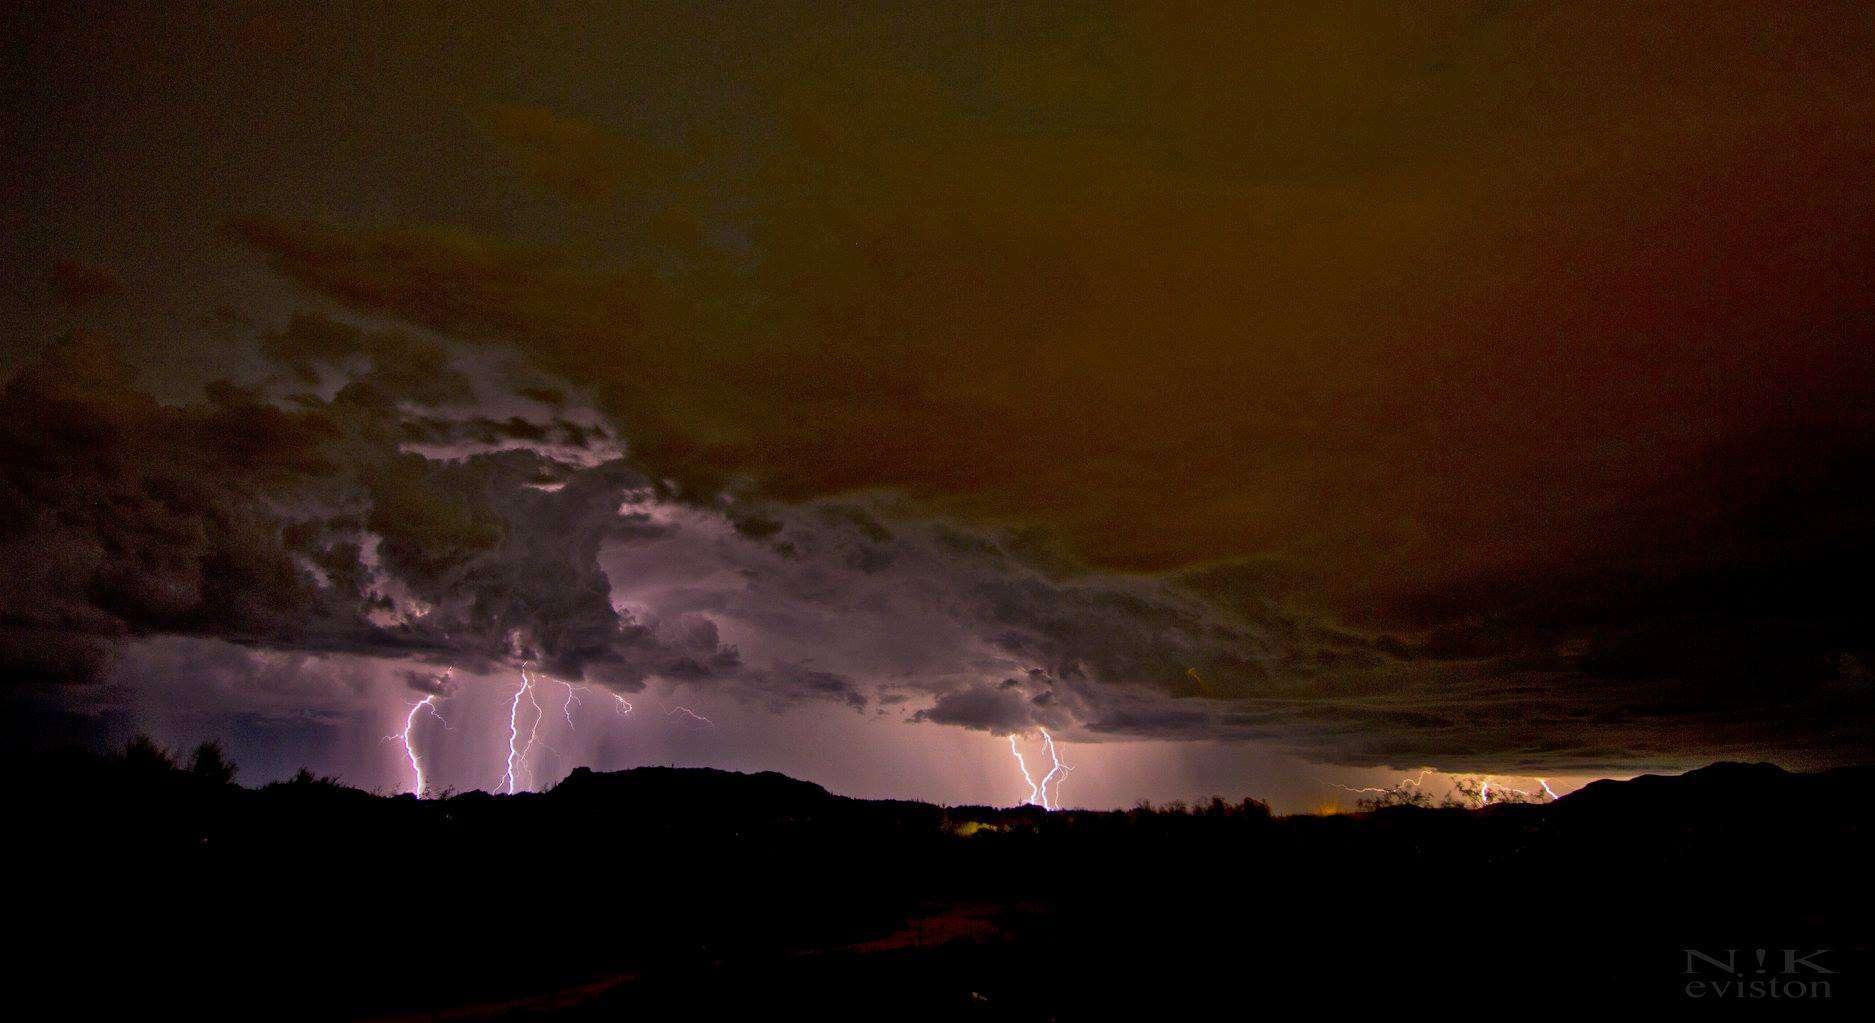 Just waiting for monsoon season. Oro Valley, Az.